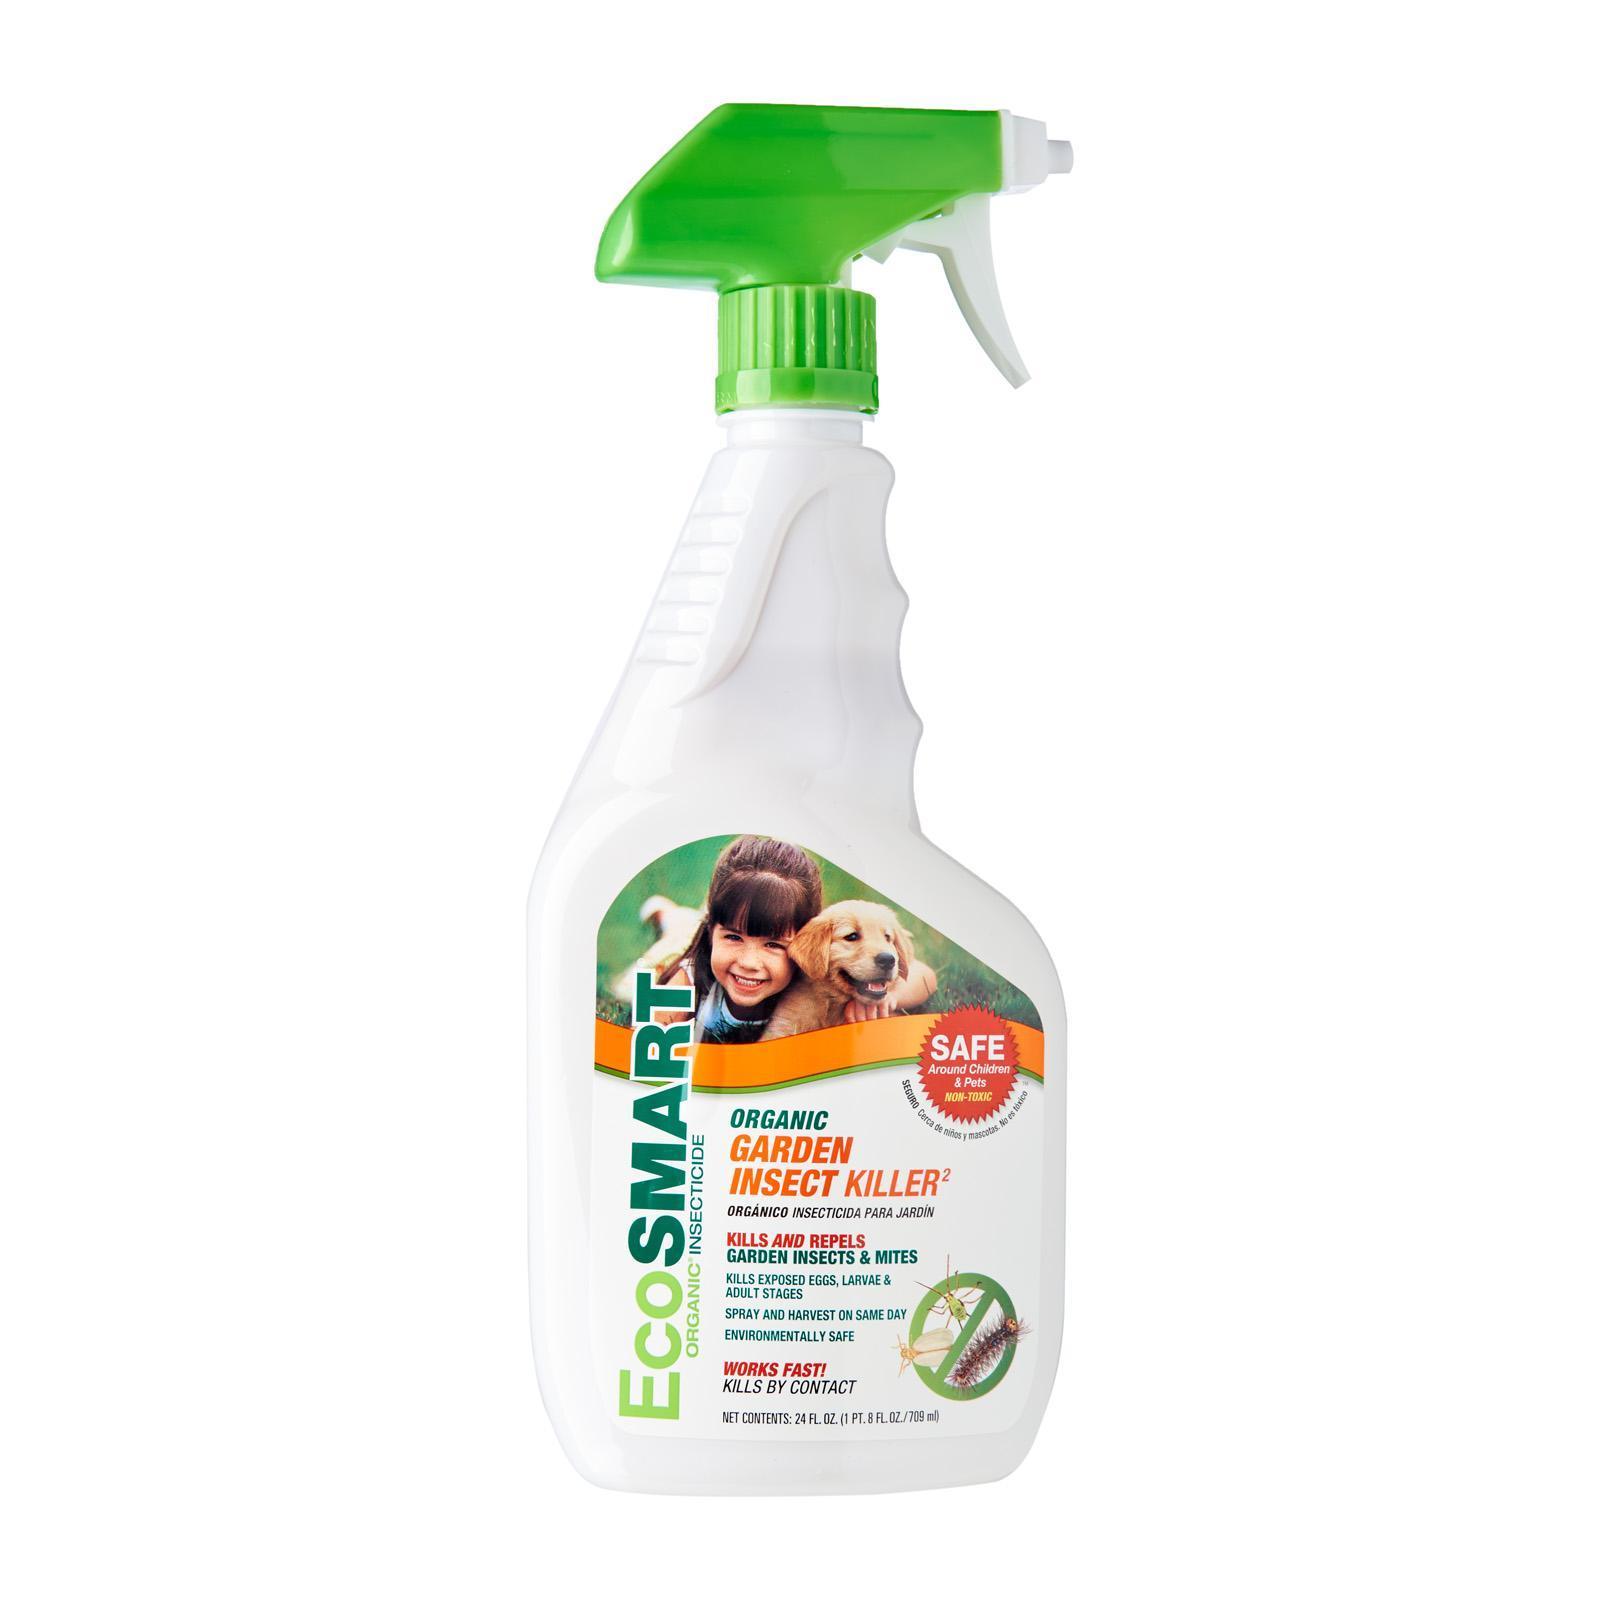 EcoSmart Organic Garden Insect Killer